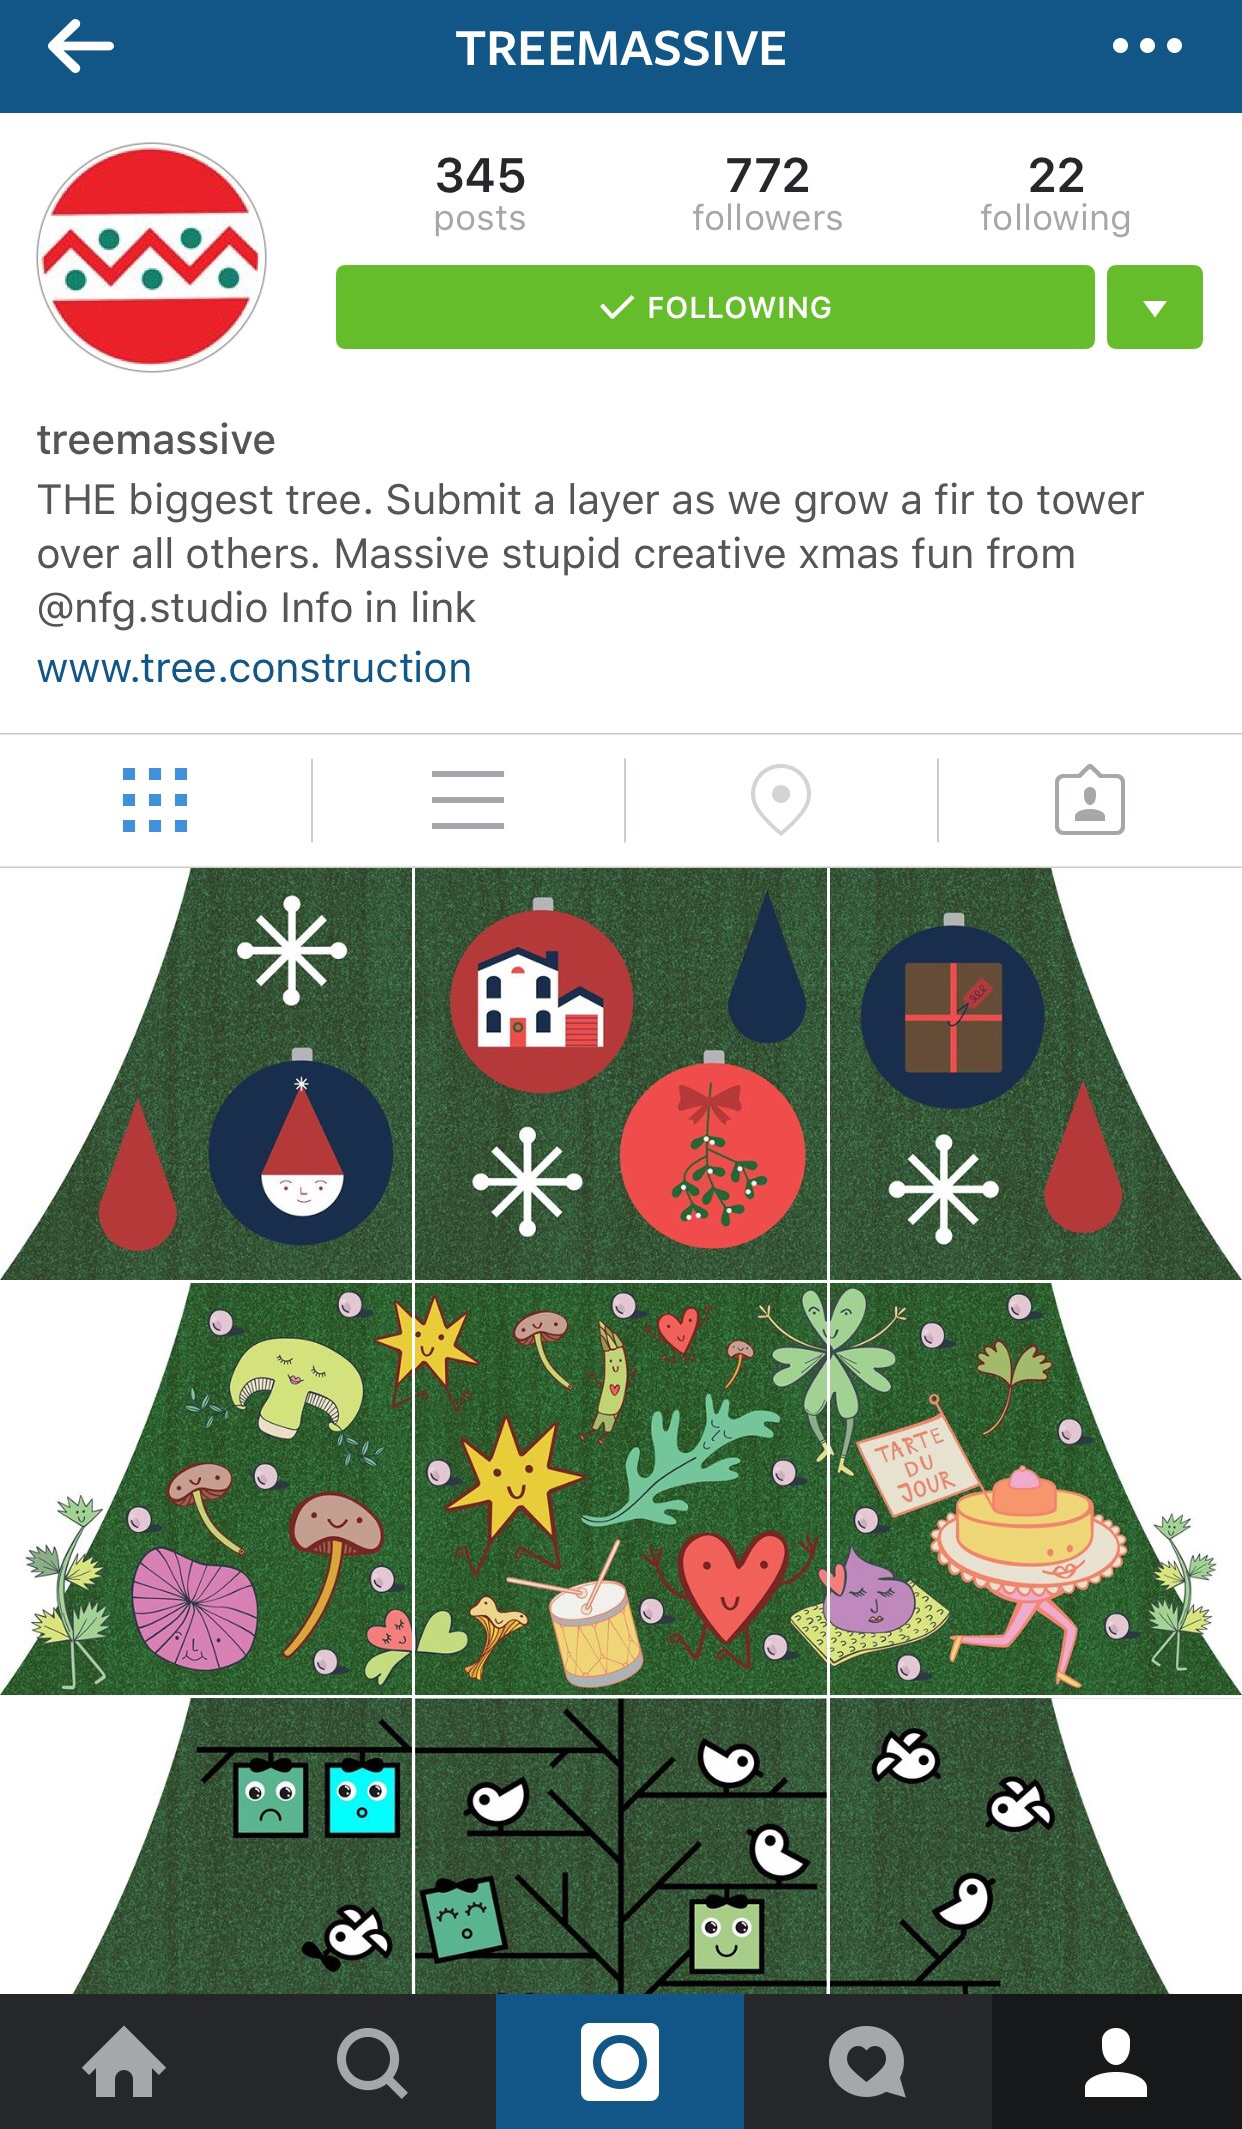 nfg studio tree massive instagram.jpg